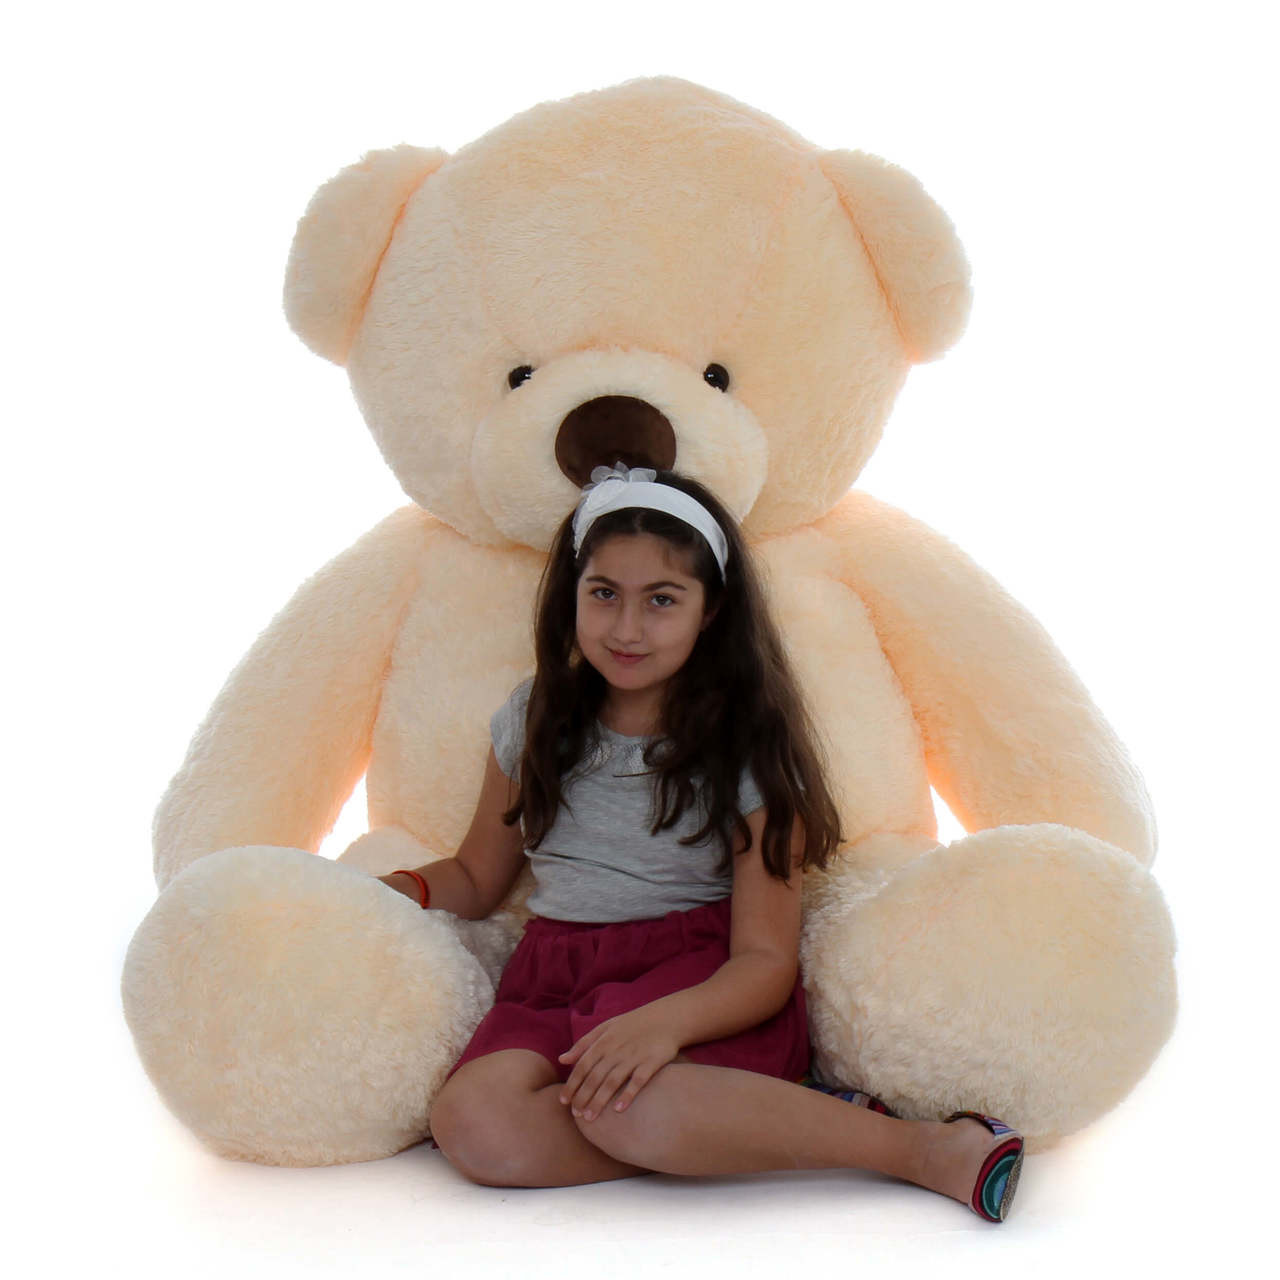 Smiley Chubs vanilla cream teddy bear 6ft Life Sized Extra Cuddly and soft